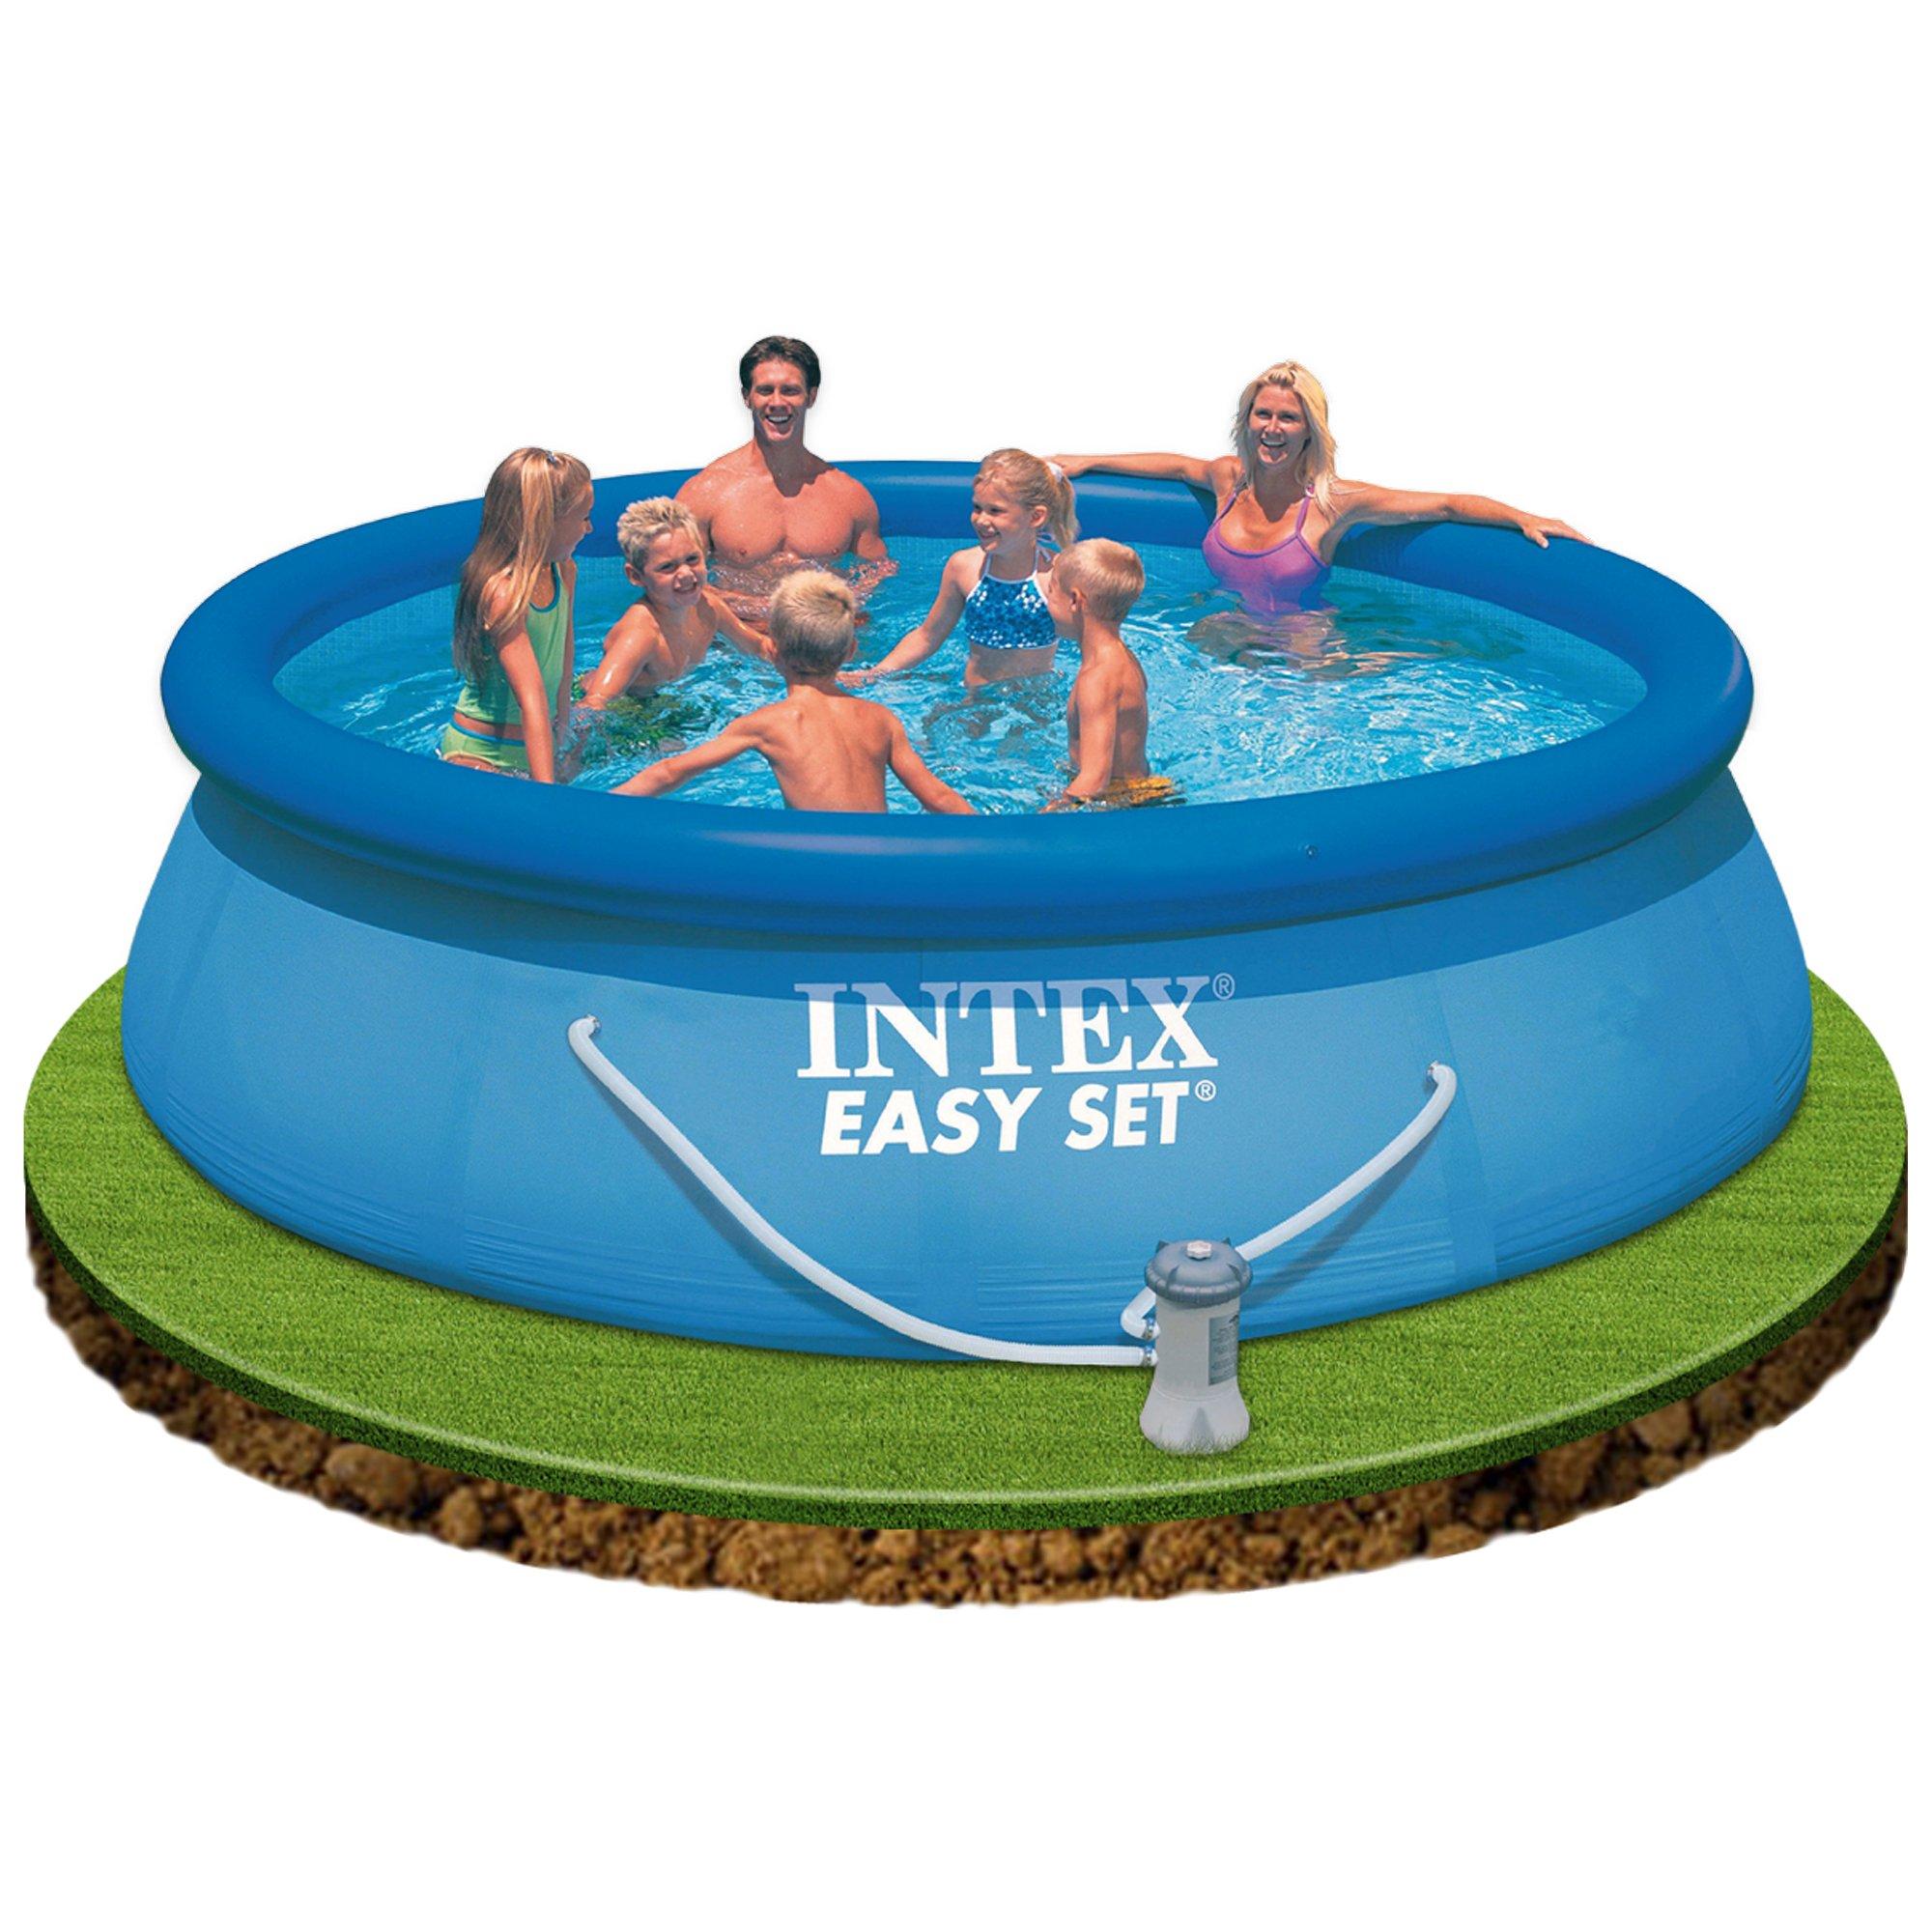 Intex Piscina Easy Set 366 cm x 76 cm Con depuradora: Amazon.es: Hogar